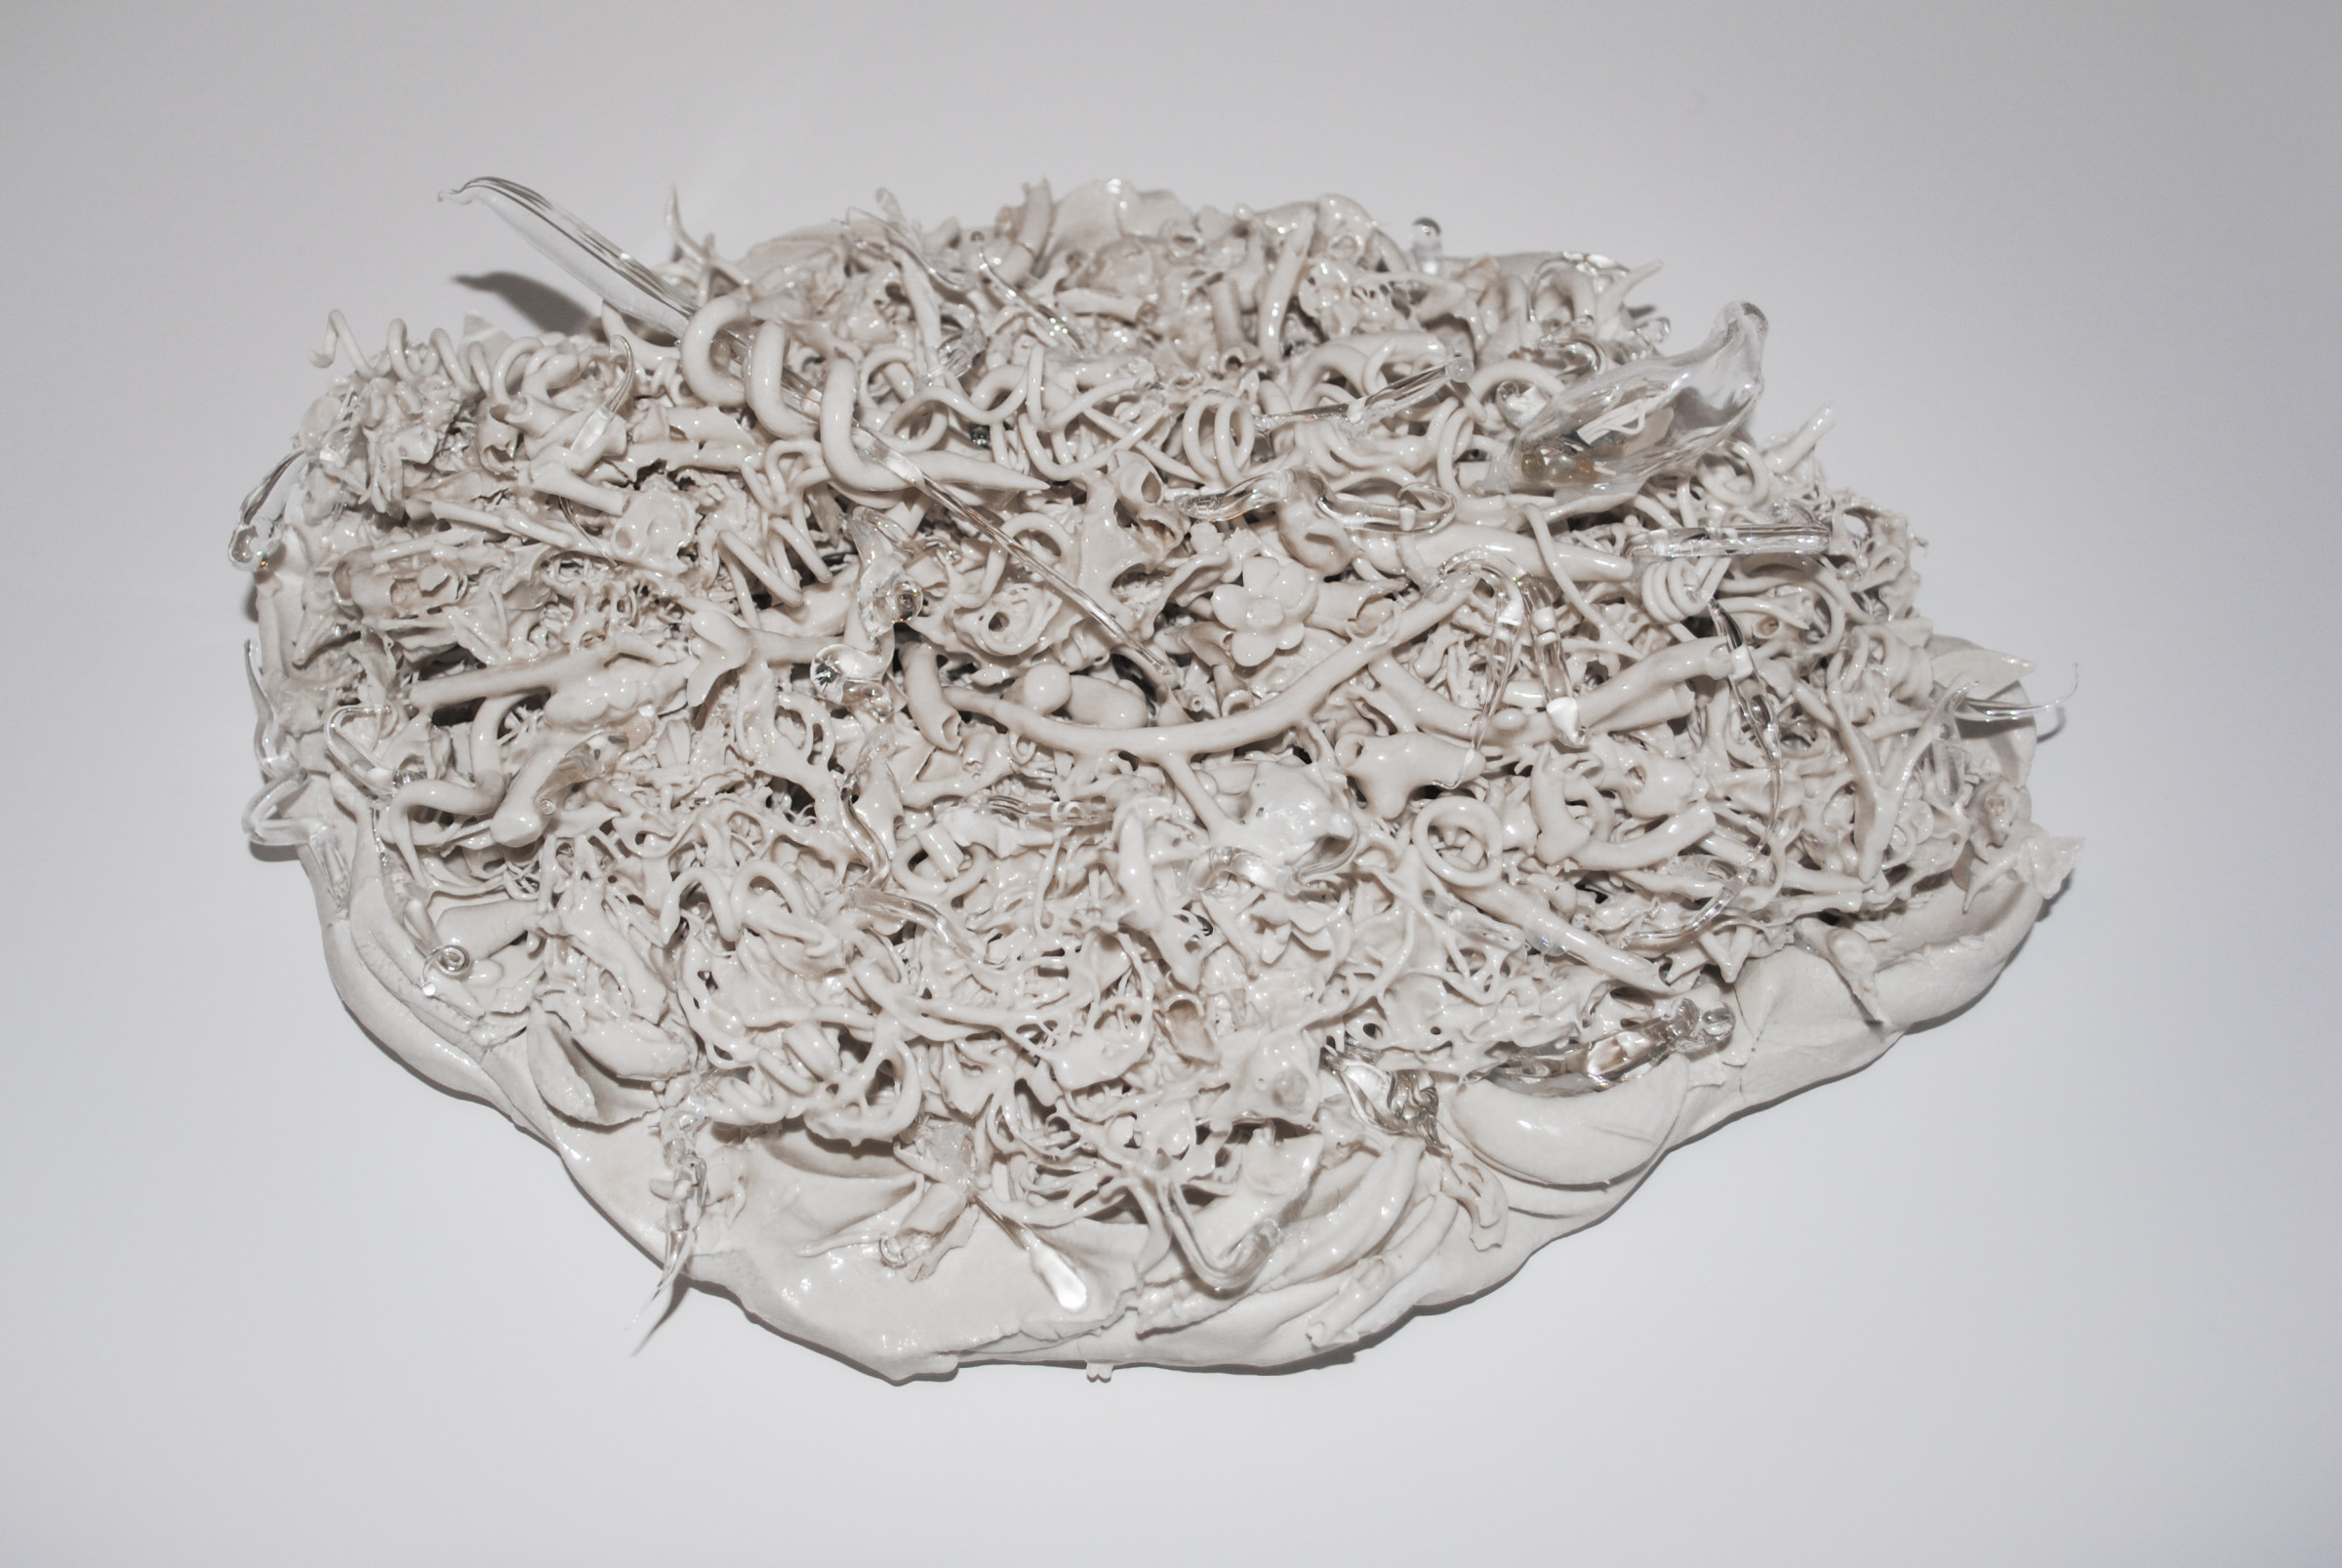 "<span class=""link fancybox-details-link""><a href=""/exhibitions/120/works/artworks1627/"">View Detail Page</a></span><div class=""artist""><strong>Lucille Lewin</strong></div><div class=""title""><em>Bucolic Body</em>, 2017</div><div class=""medium"">Porcelain and glass</div><div class=""dimensions"">35 x 20 x 6 cm<br>13 3/4 x 7 7/8 x 2 3/8 in.</div>"